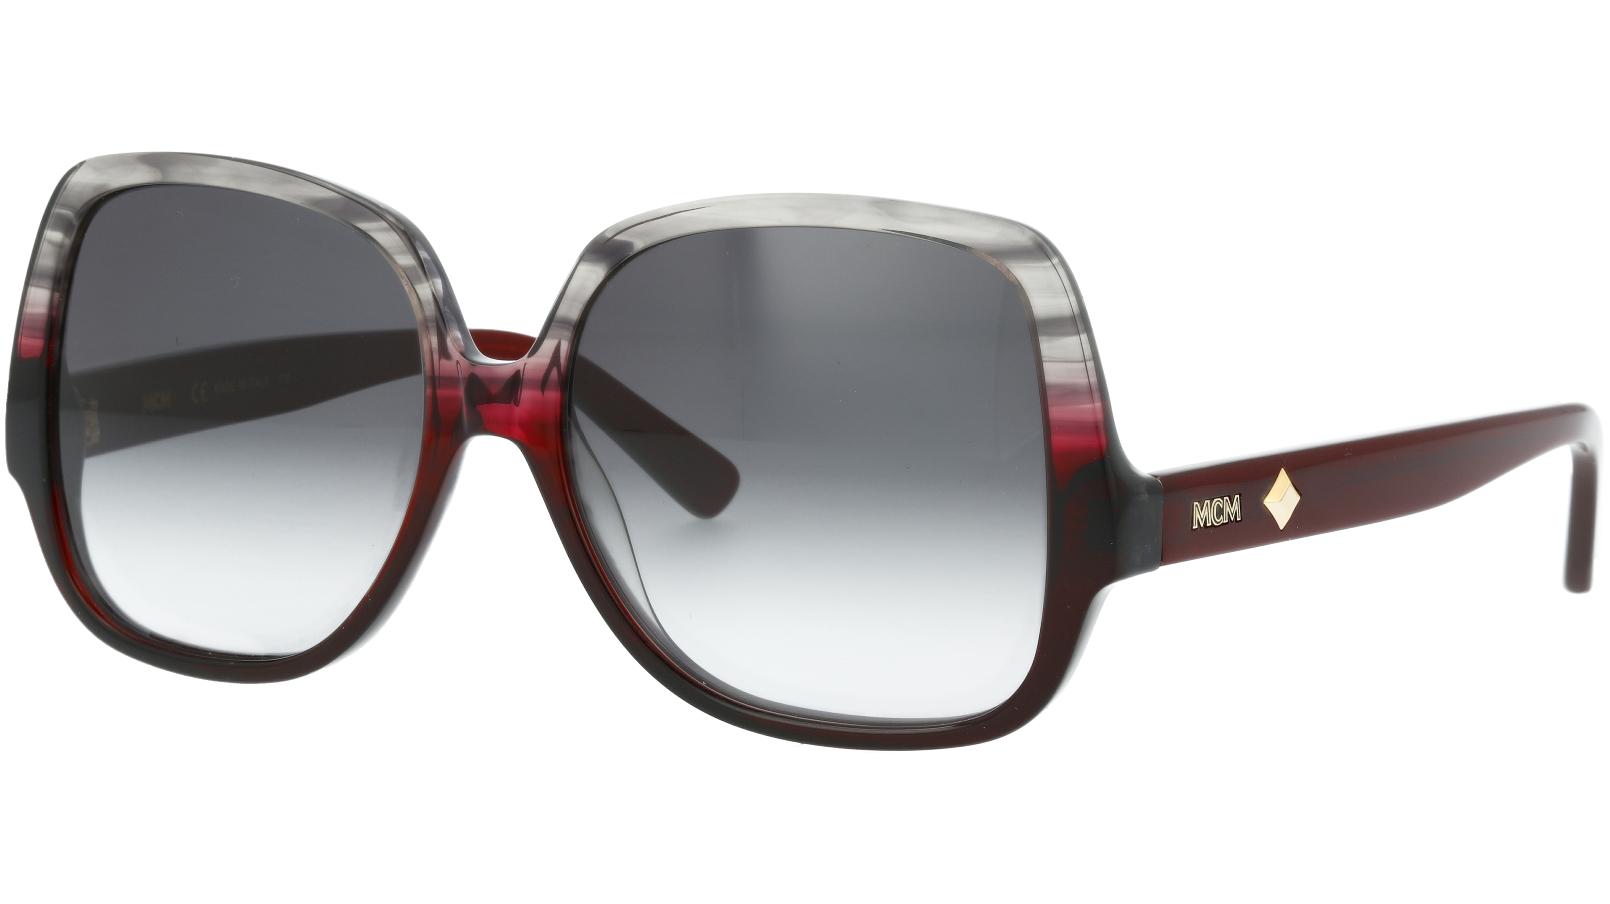 MCM MCM614S 026 58 STRIPED Sunglasses